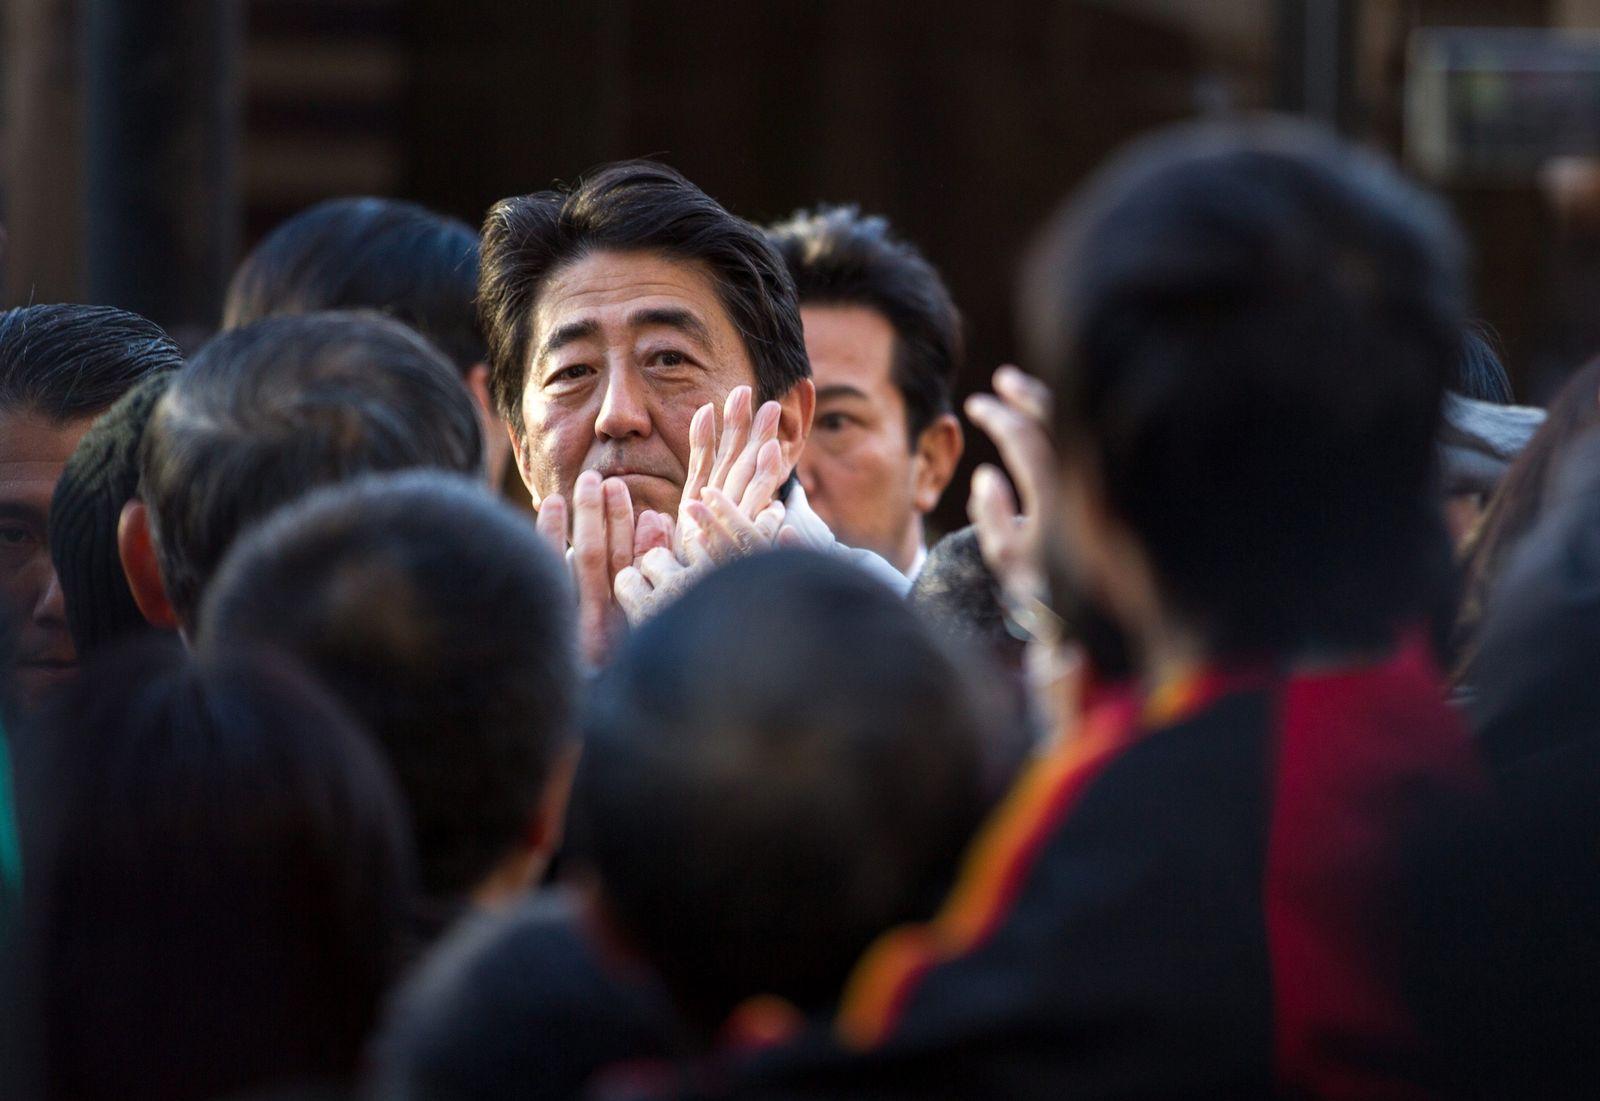 Japanese Prime Minister Shinzo Abe speaks to voters in Tokyo